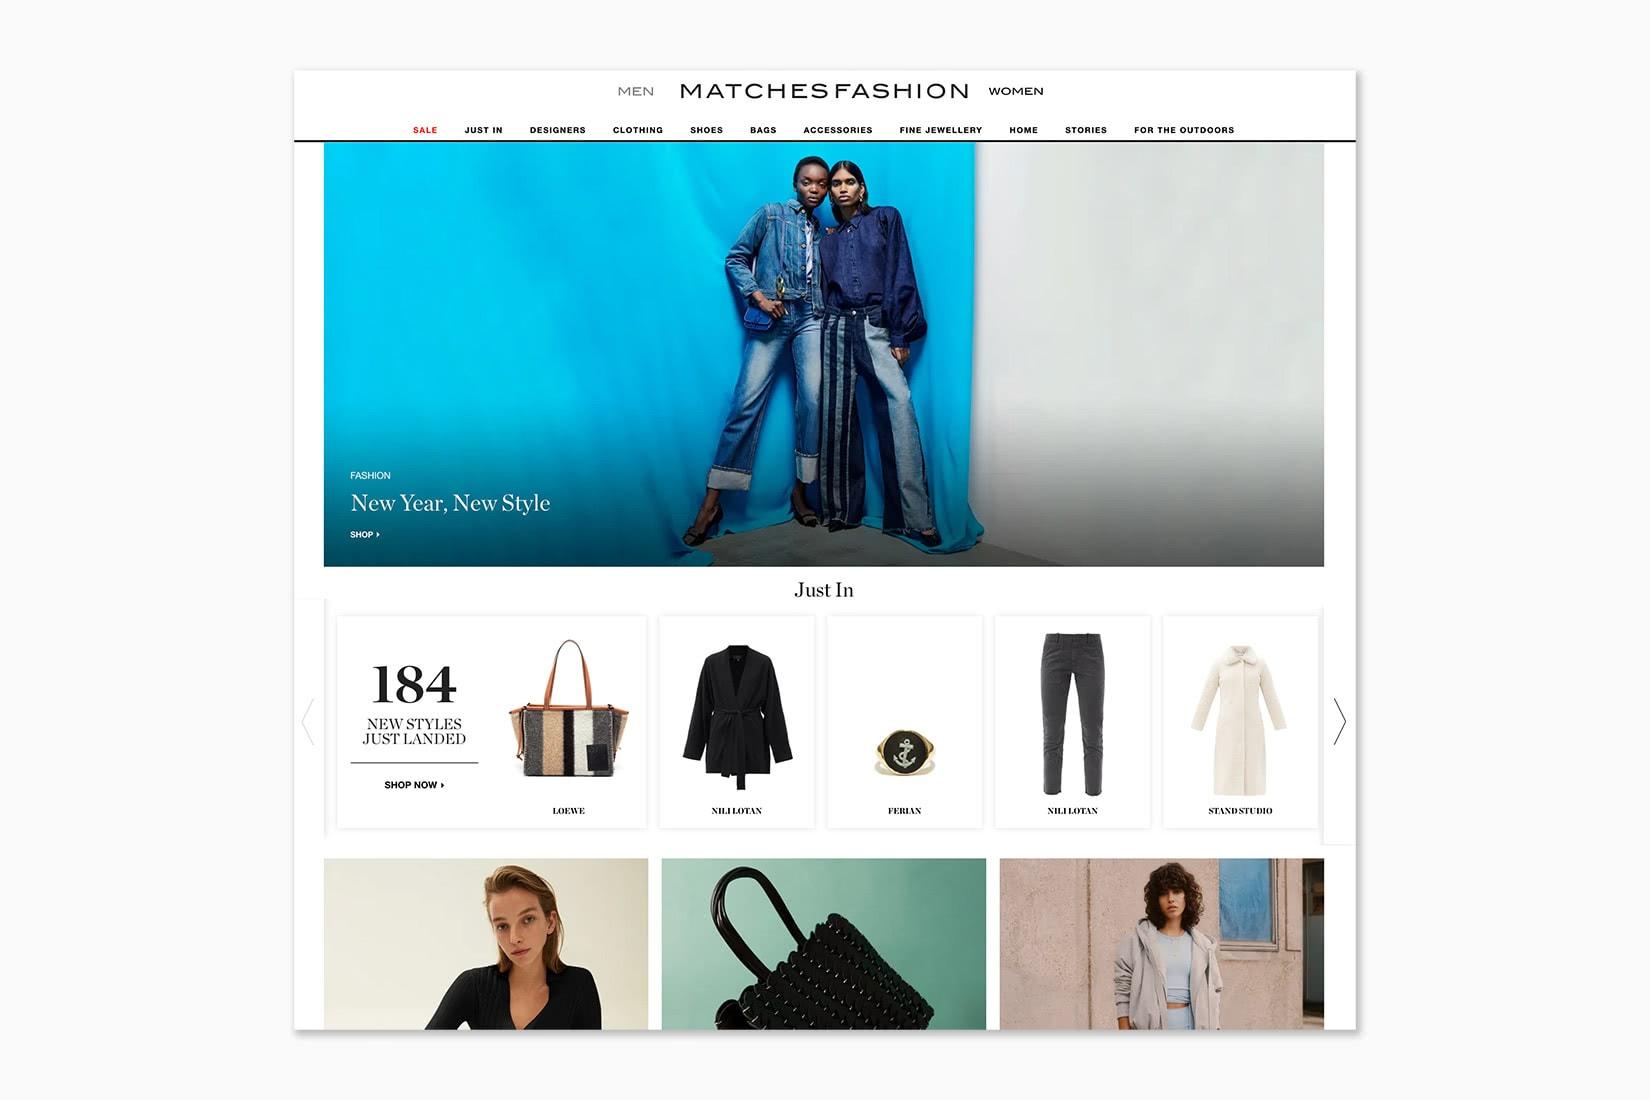 best online shopping sites women MatchesFashion - Luxe Digital